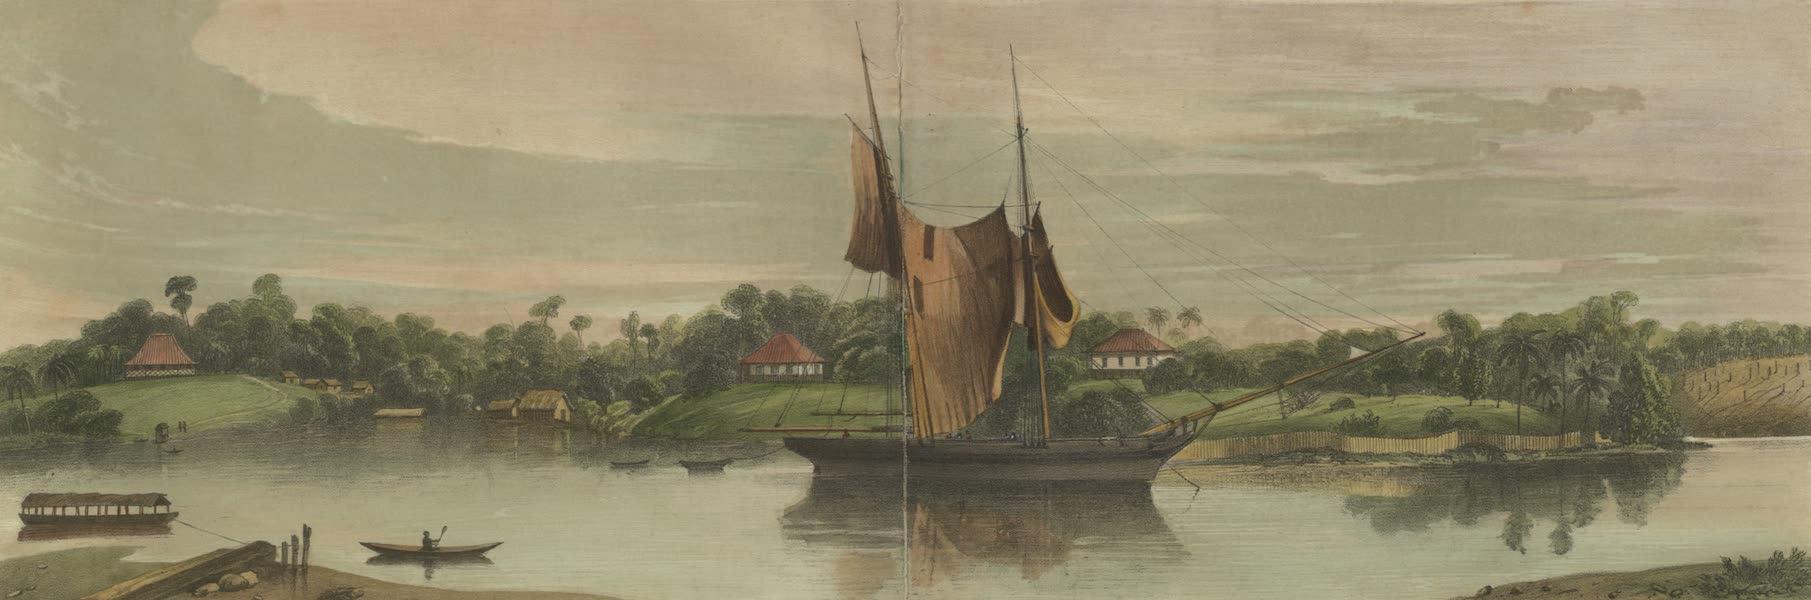 Kuching, Sawawak, Borneo. The settlement founded by James Brooke, Esqr.